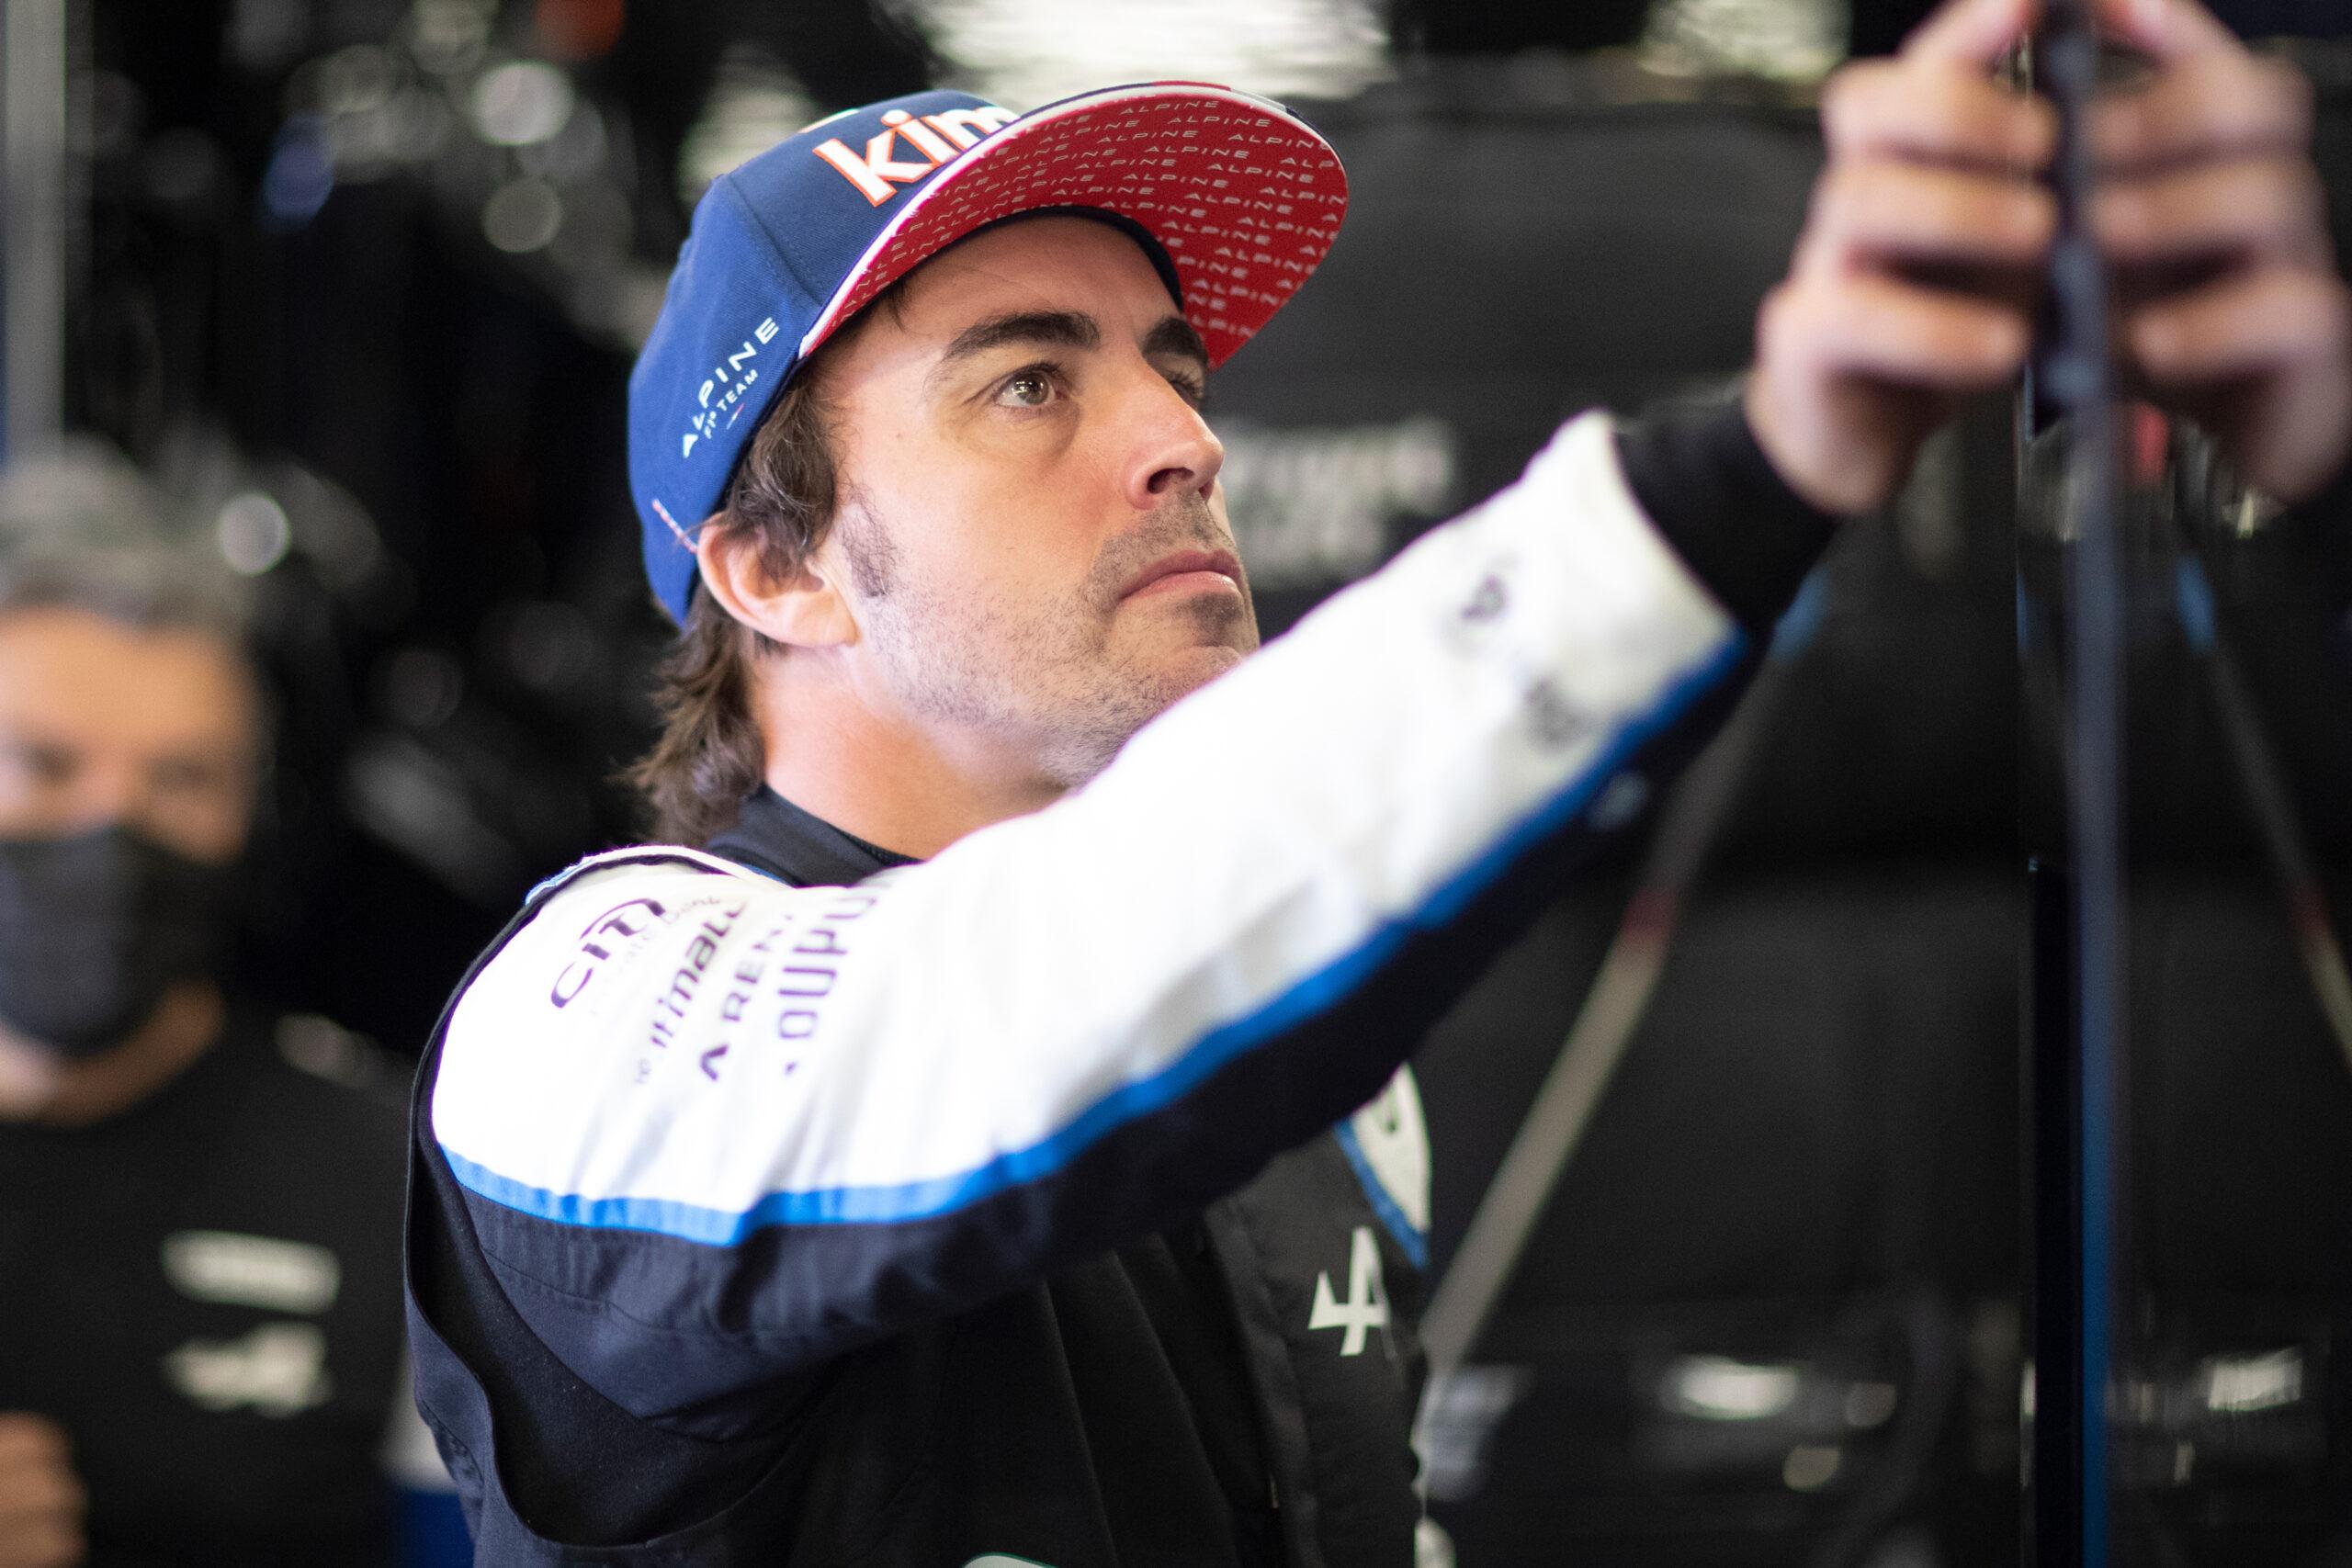 F1 - Alonso est revenu à son meilleur niveau selon Budkowski